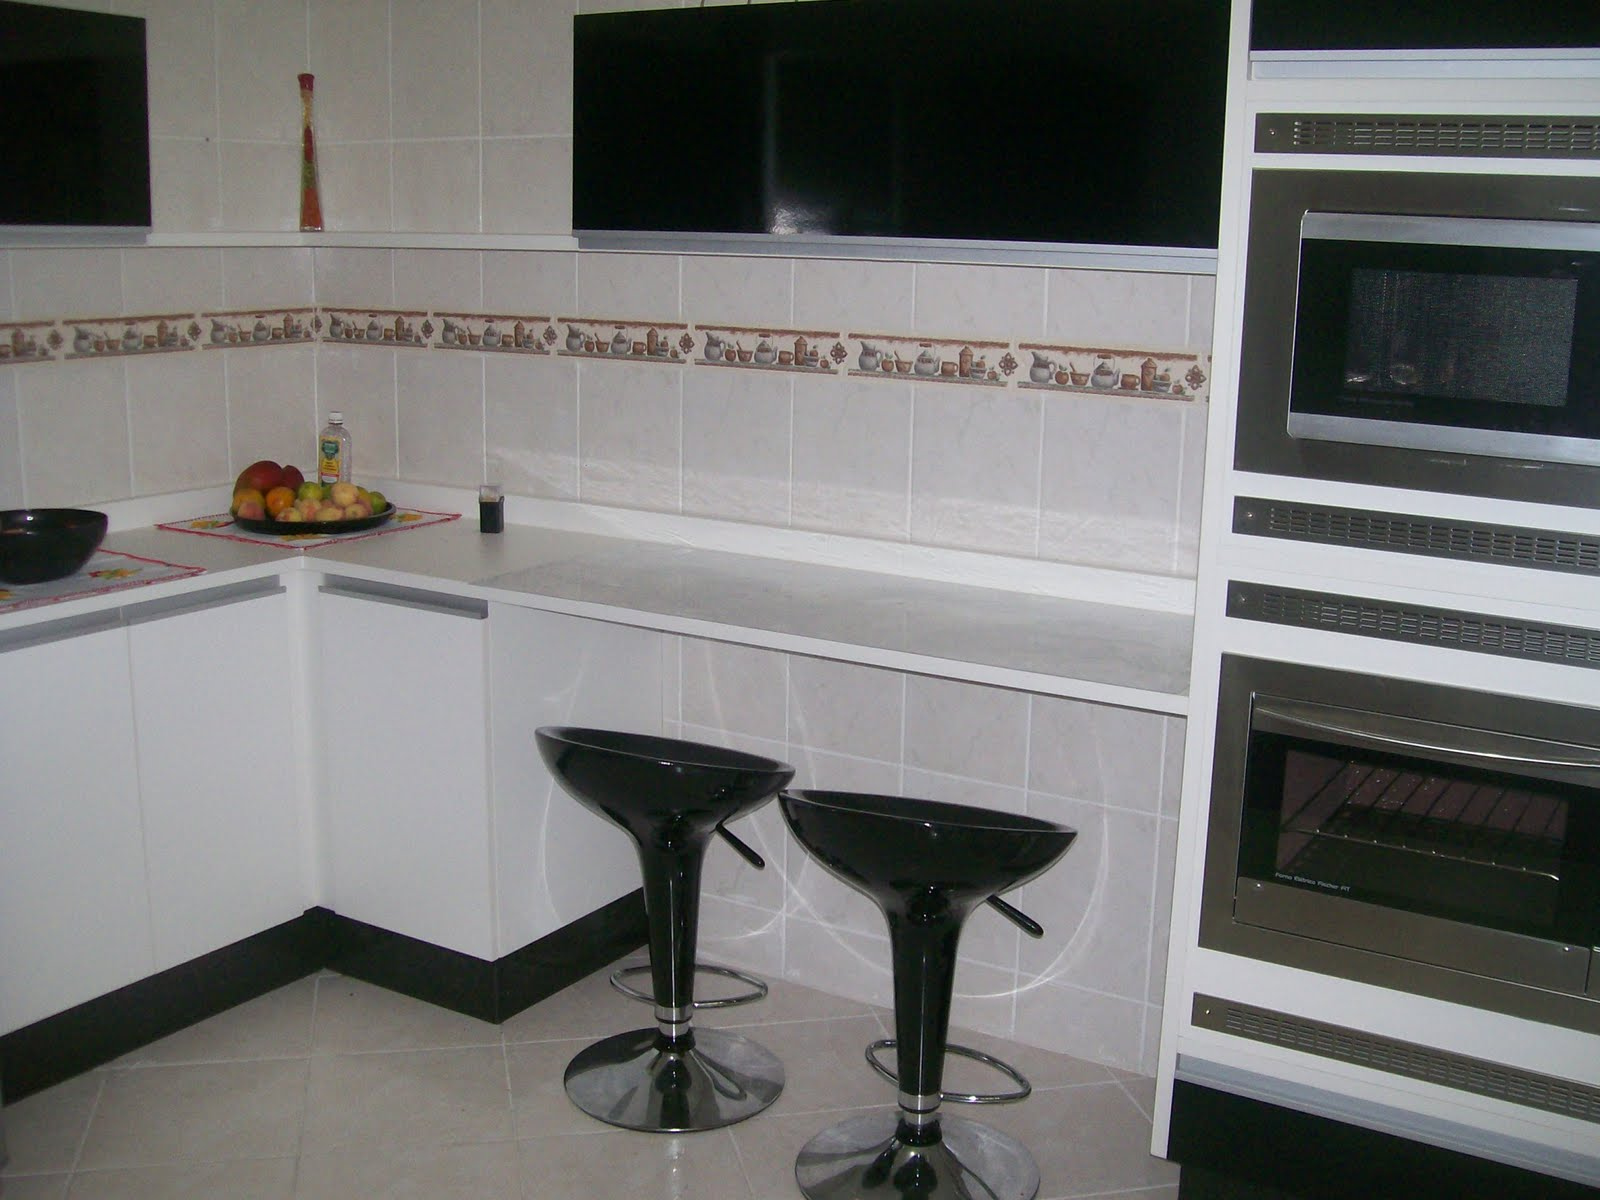 15 Top Banquetas Para Cozinha Wallpapers #63493C 1600 1200